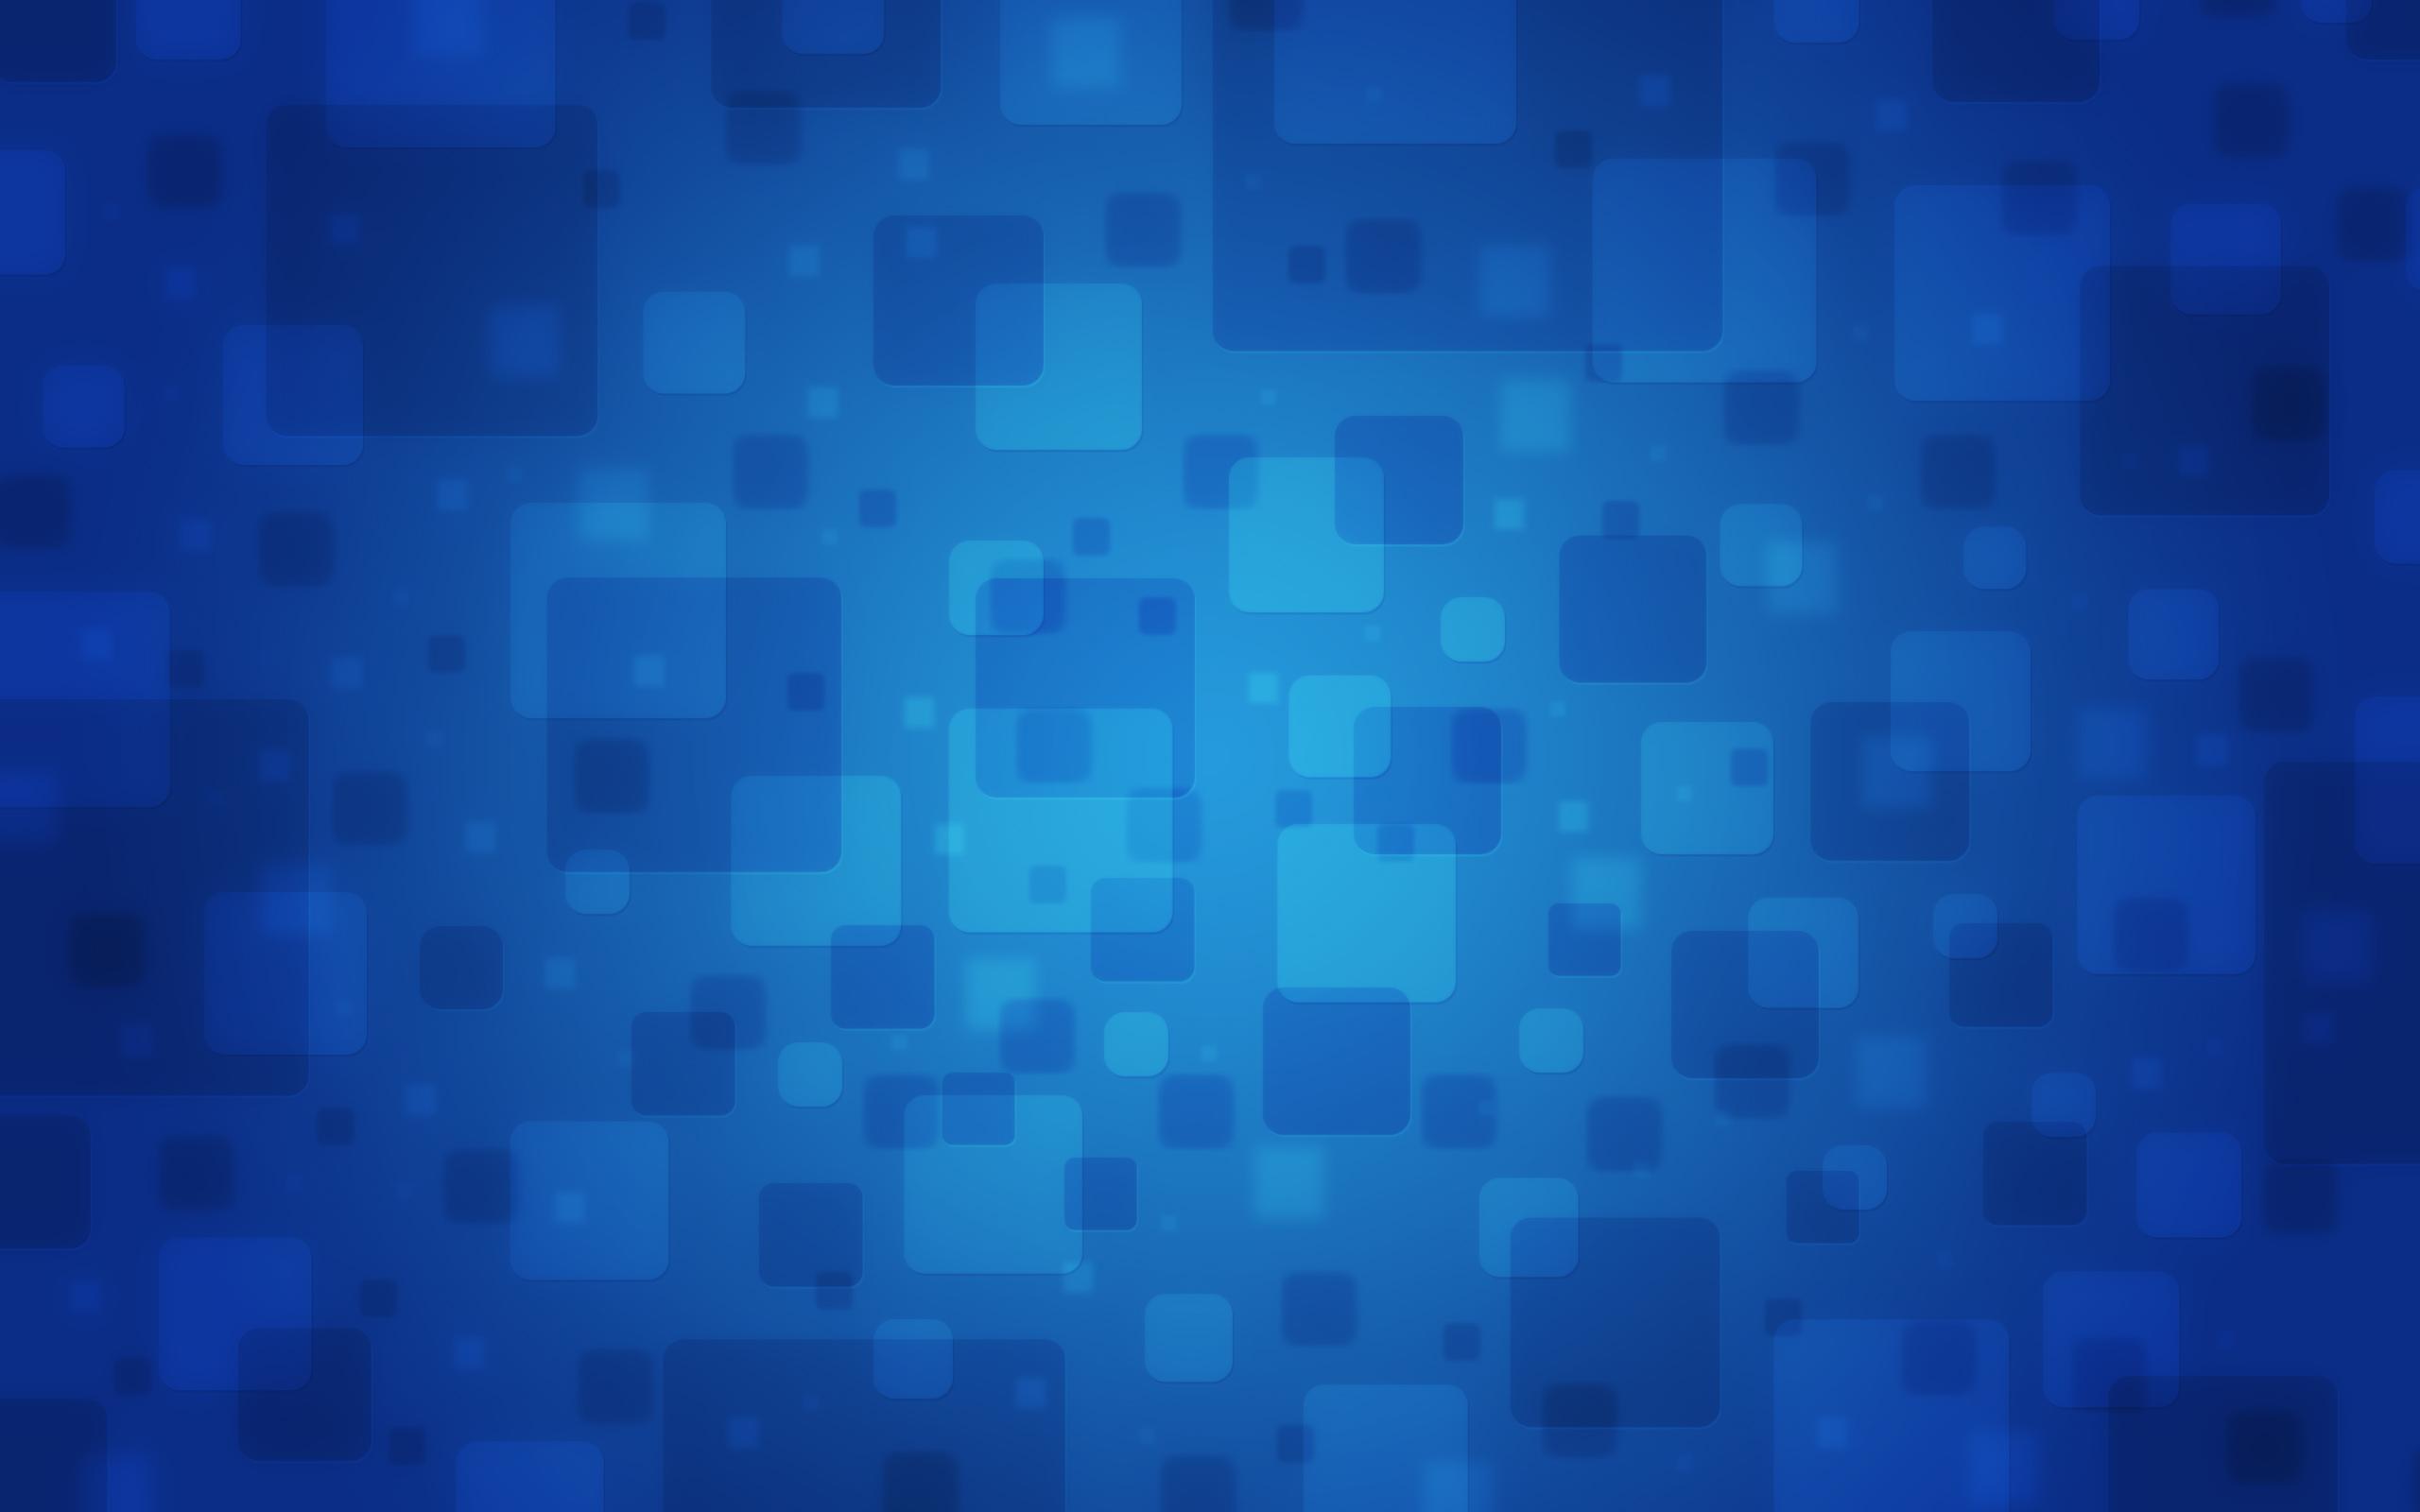 Neat Blue Background